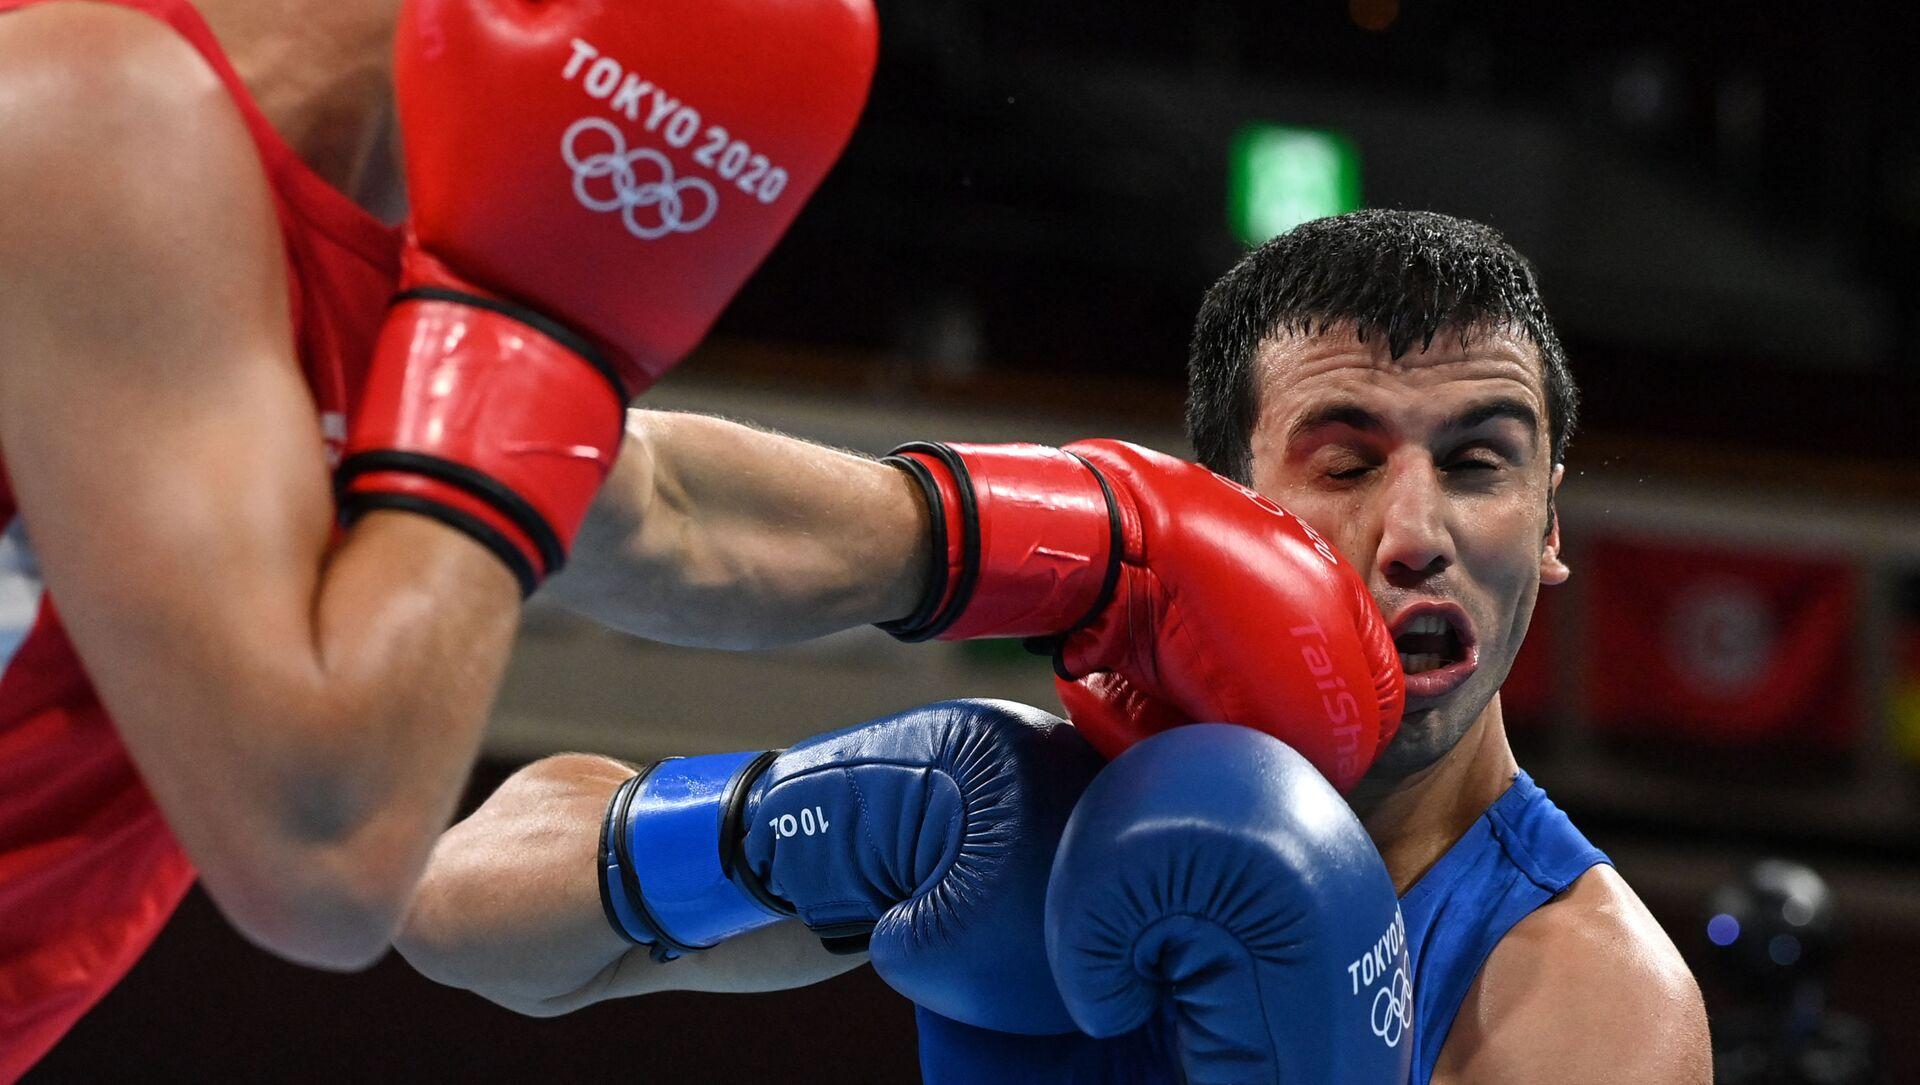 Азербайджанский боксер Джавид Челебиев - Sputnik Азербайджан, 1920, 31.07.2021